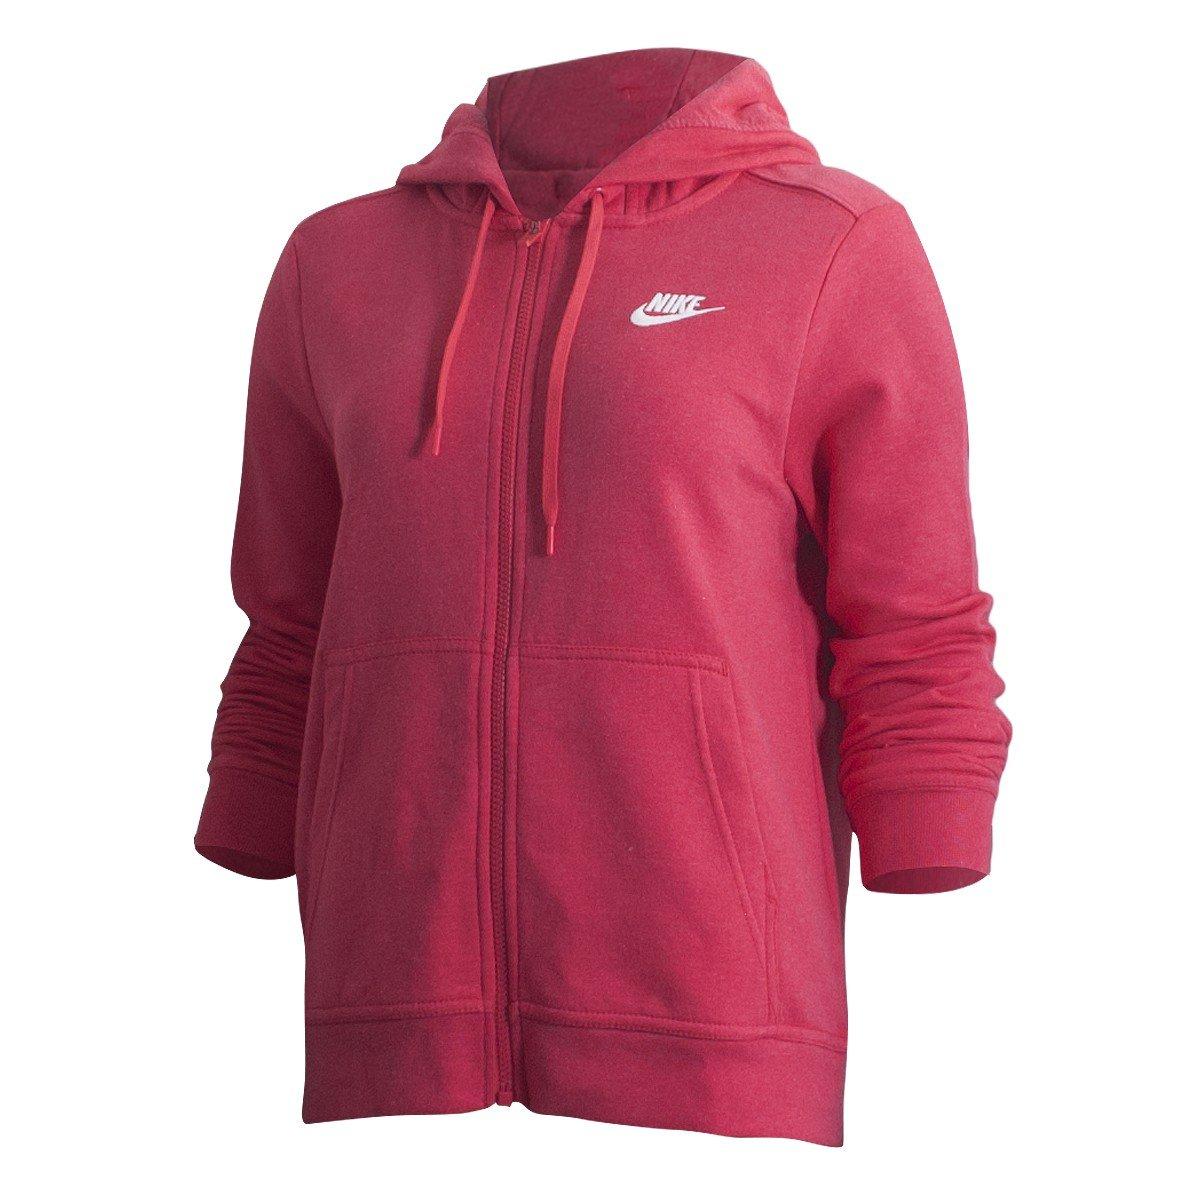 1208c68db3 Jaqueta Moletom Nike Hoddie feminino 853930 Nike - RSA - Girardi ...